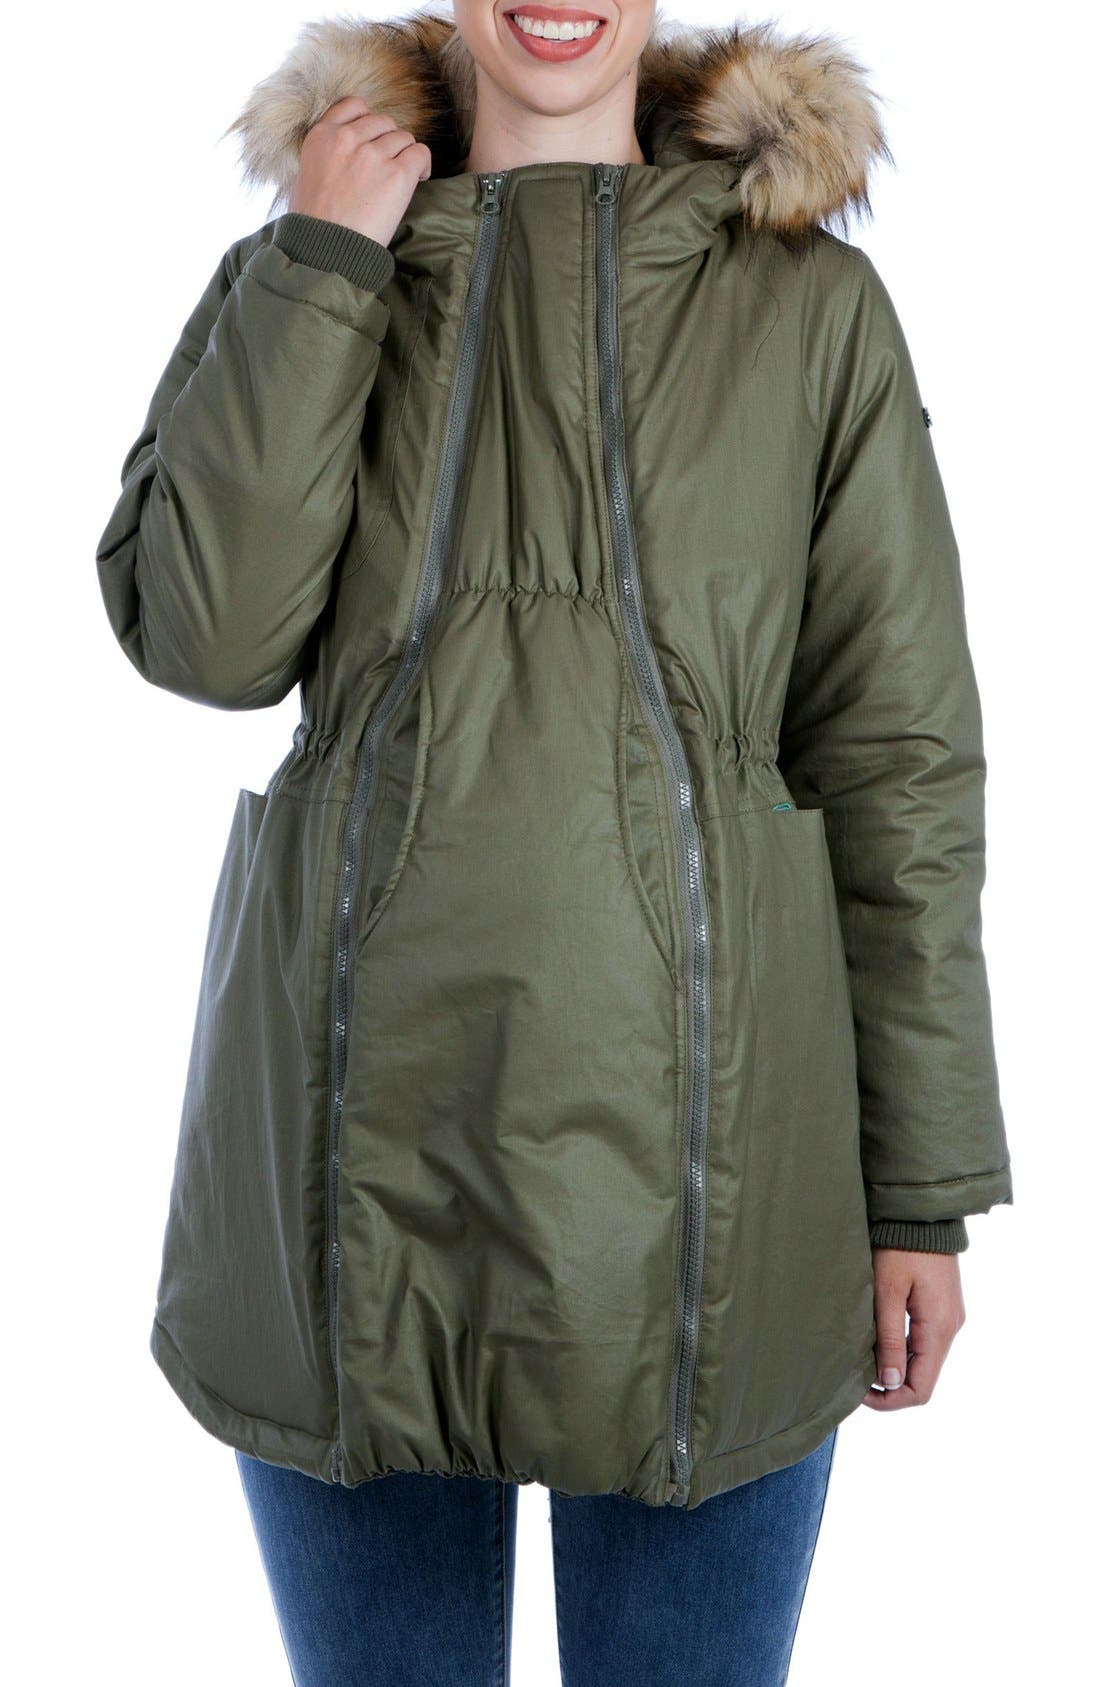 Sofia Waxed 3-in-1 Maternity/Nursing Jacket with Faux Fur Trim,                             Main thumbnail 1, color,                             KHAKI GREEN